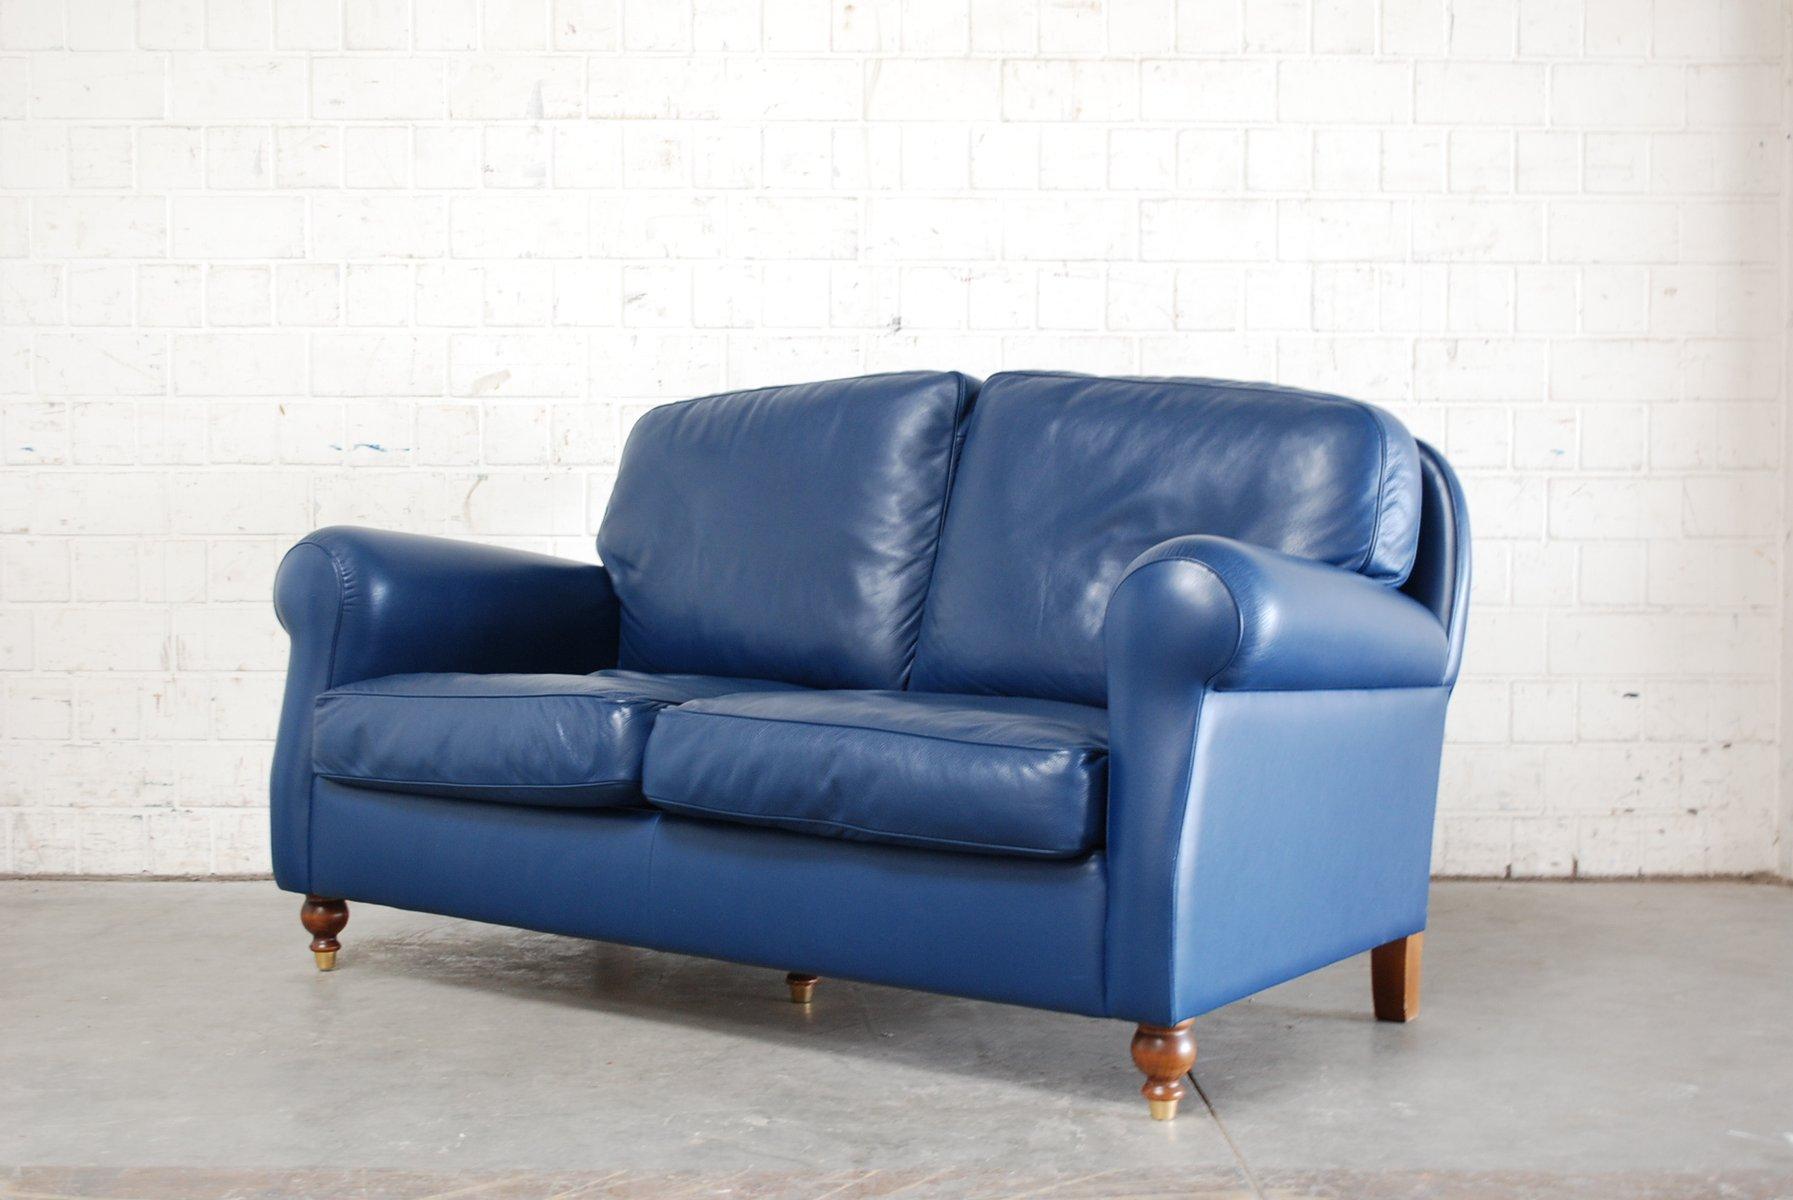 Sofa George in pelle blu di Poltrona Frau, 1999 in vendita su Pamono